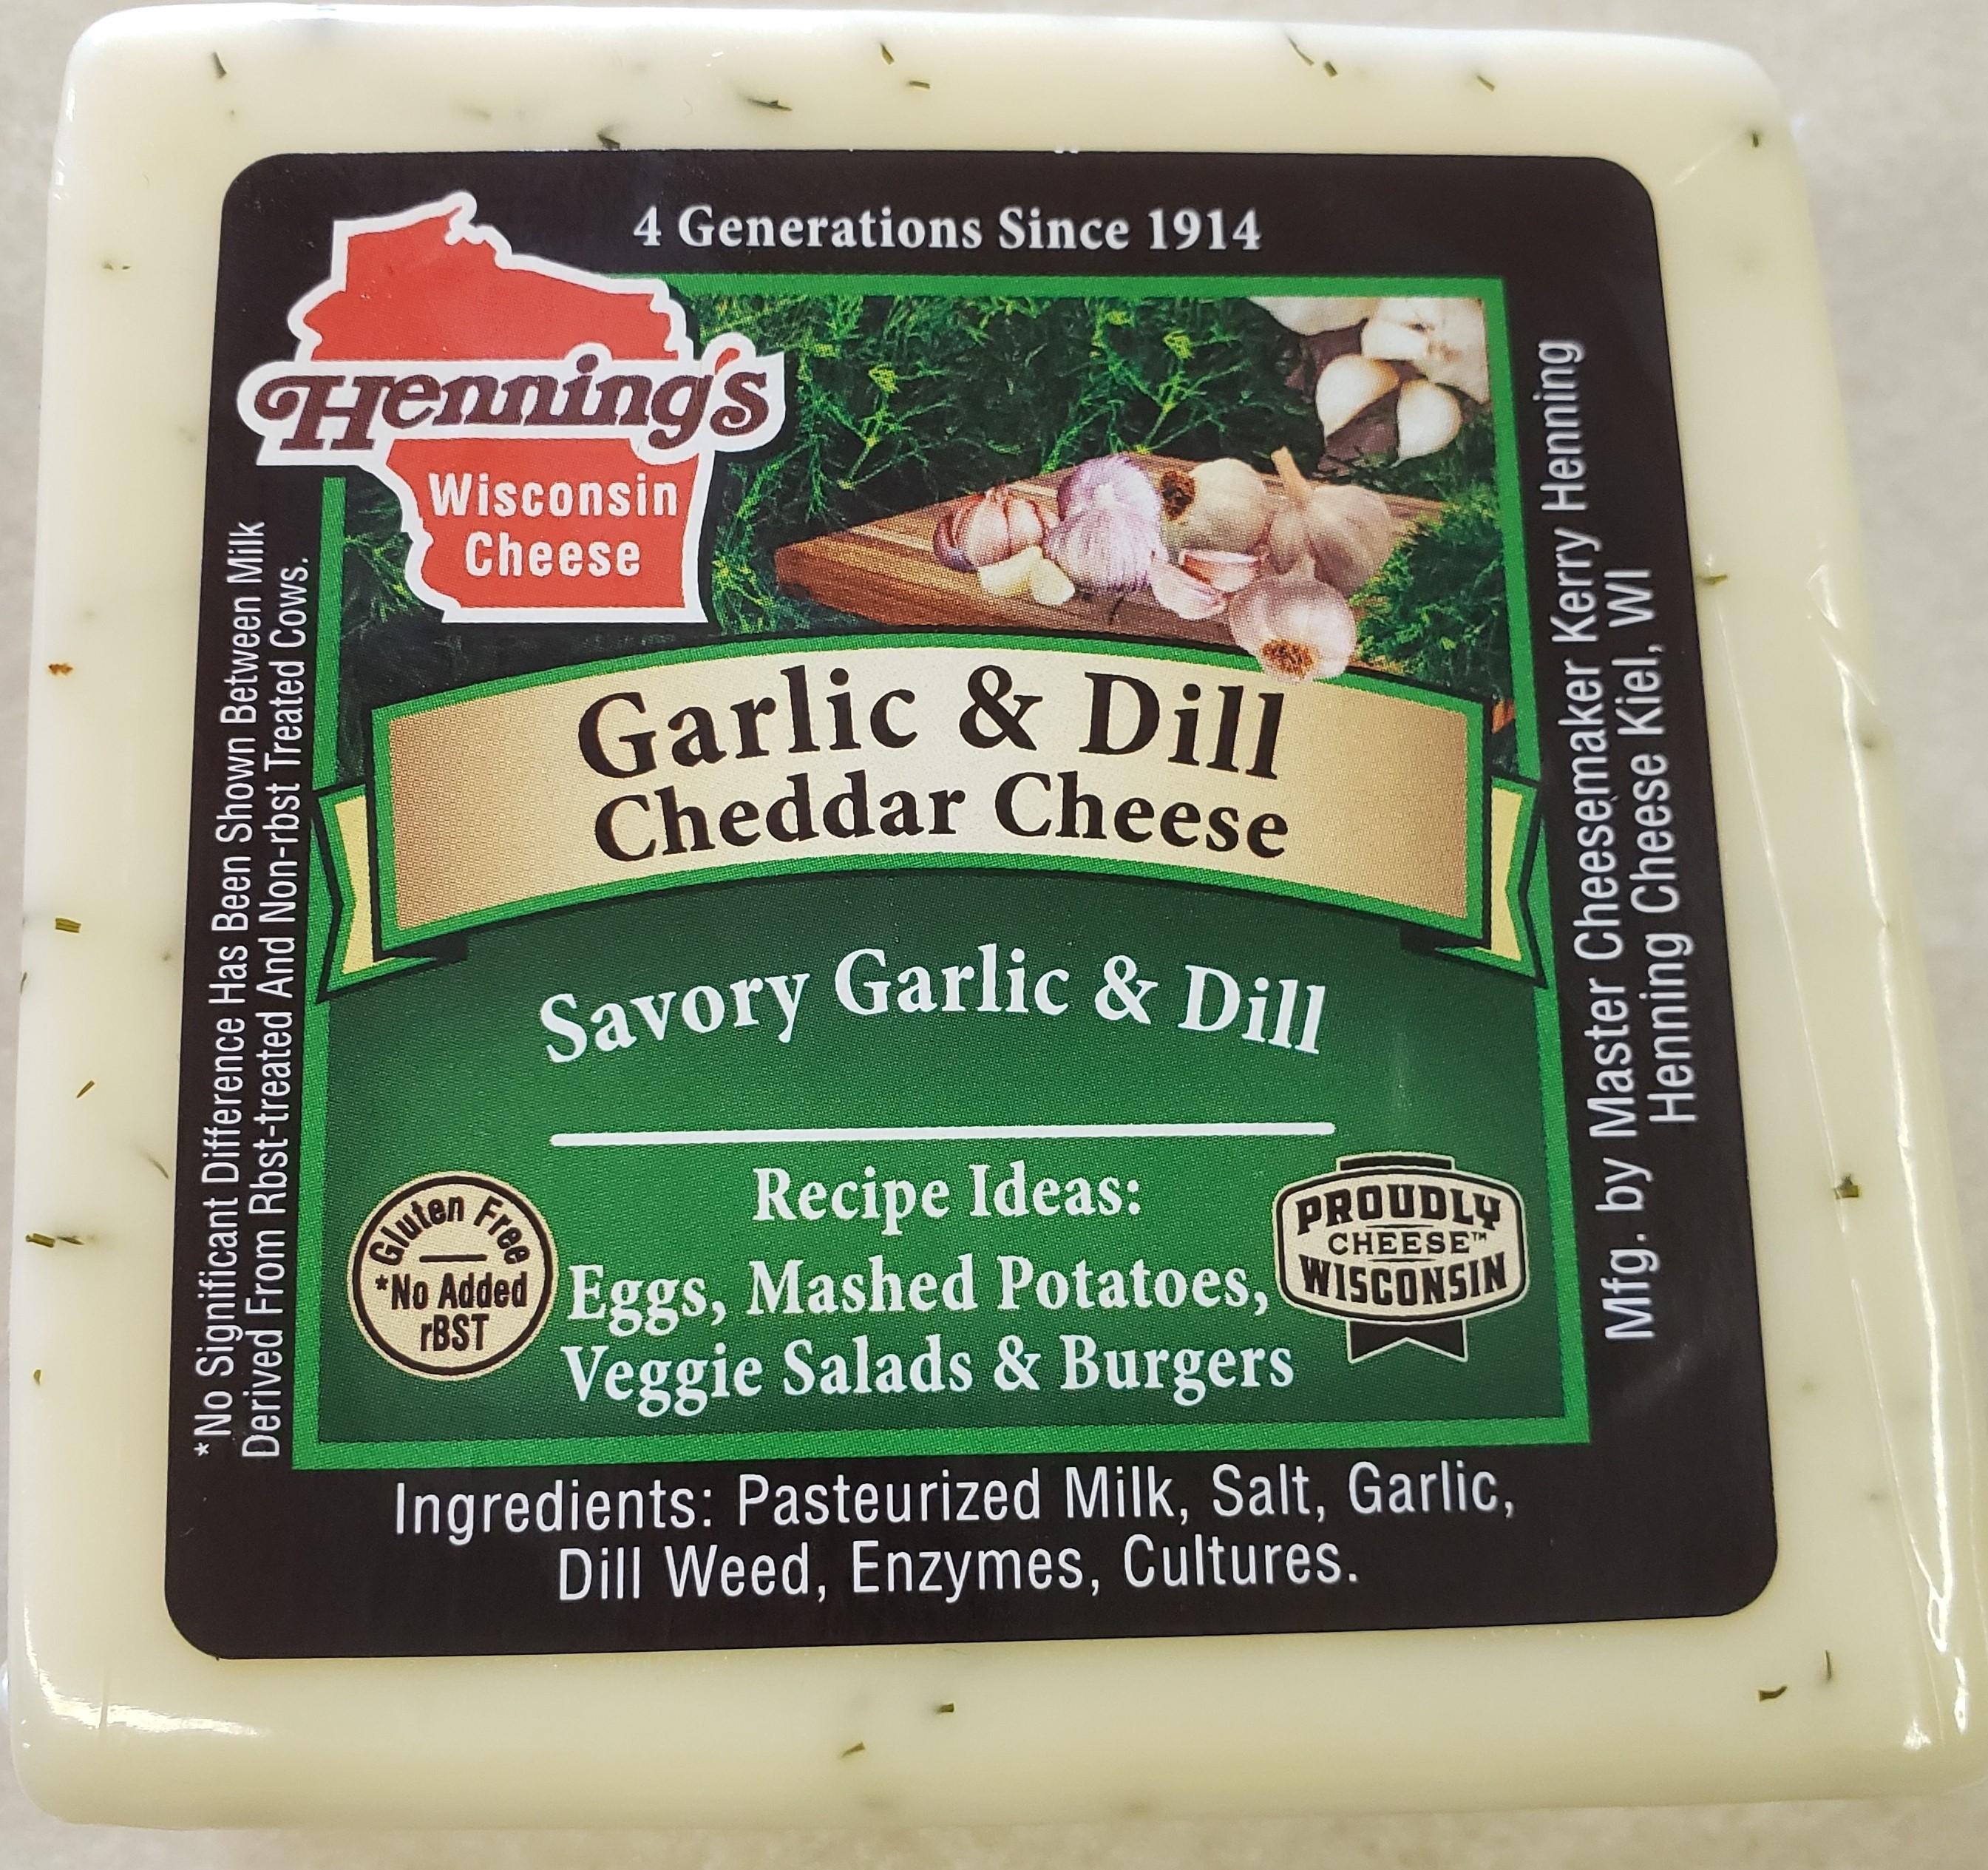 Henning's Garlic & Dill White Cheddar